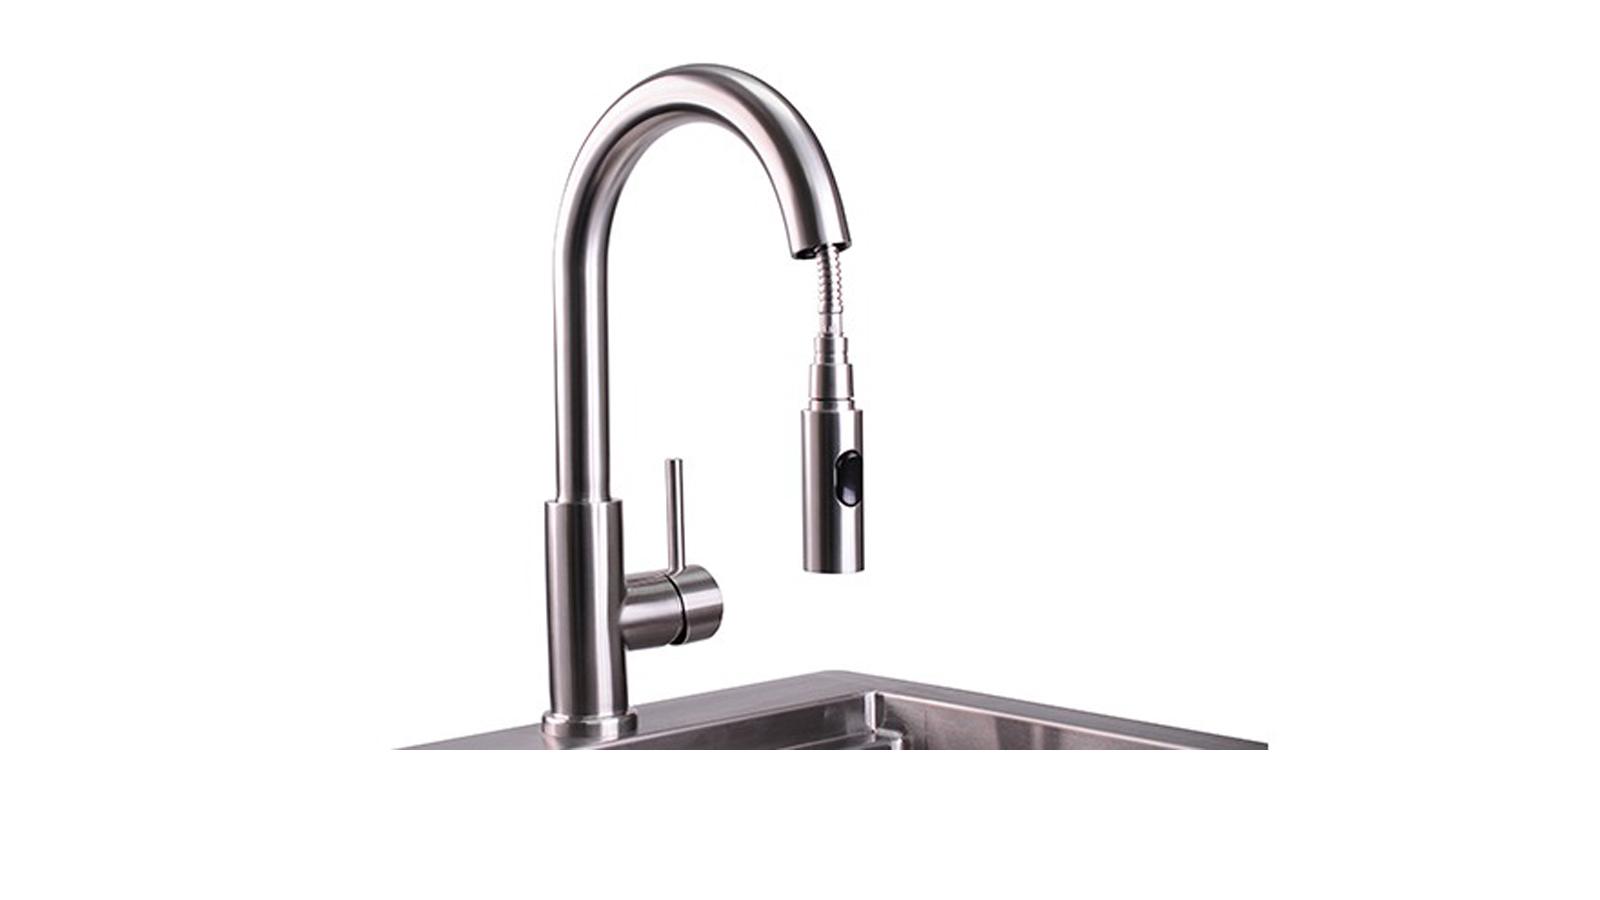 Professional Gooseneck Pull Down Faucet (LPFK)